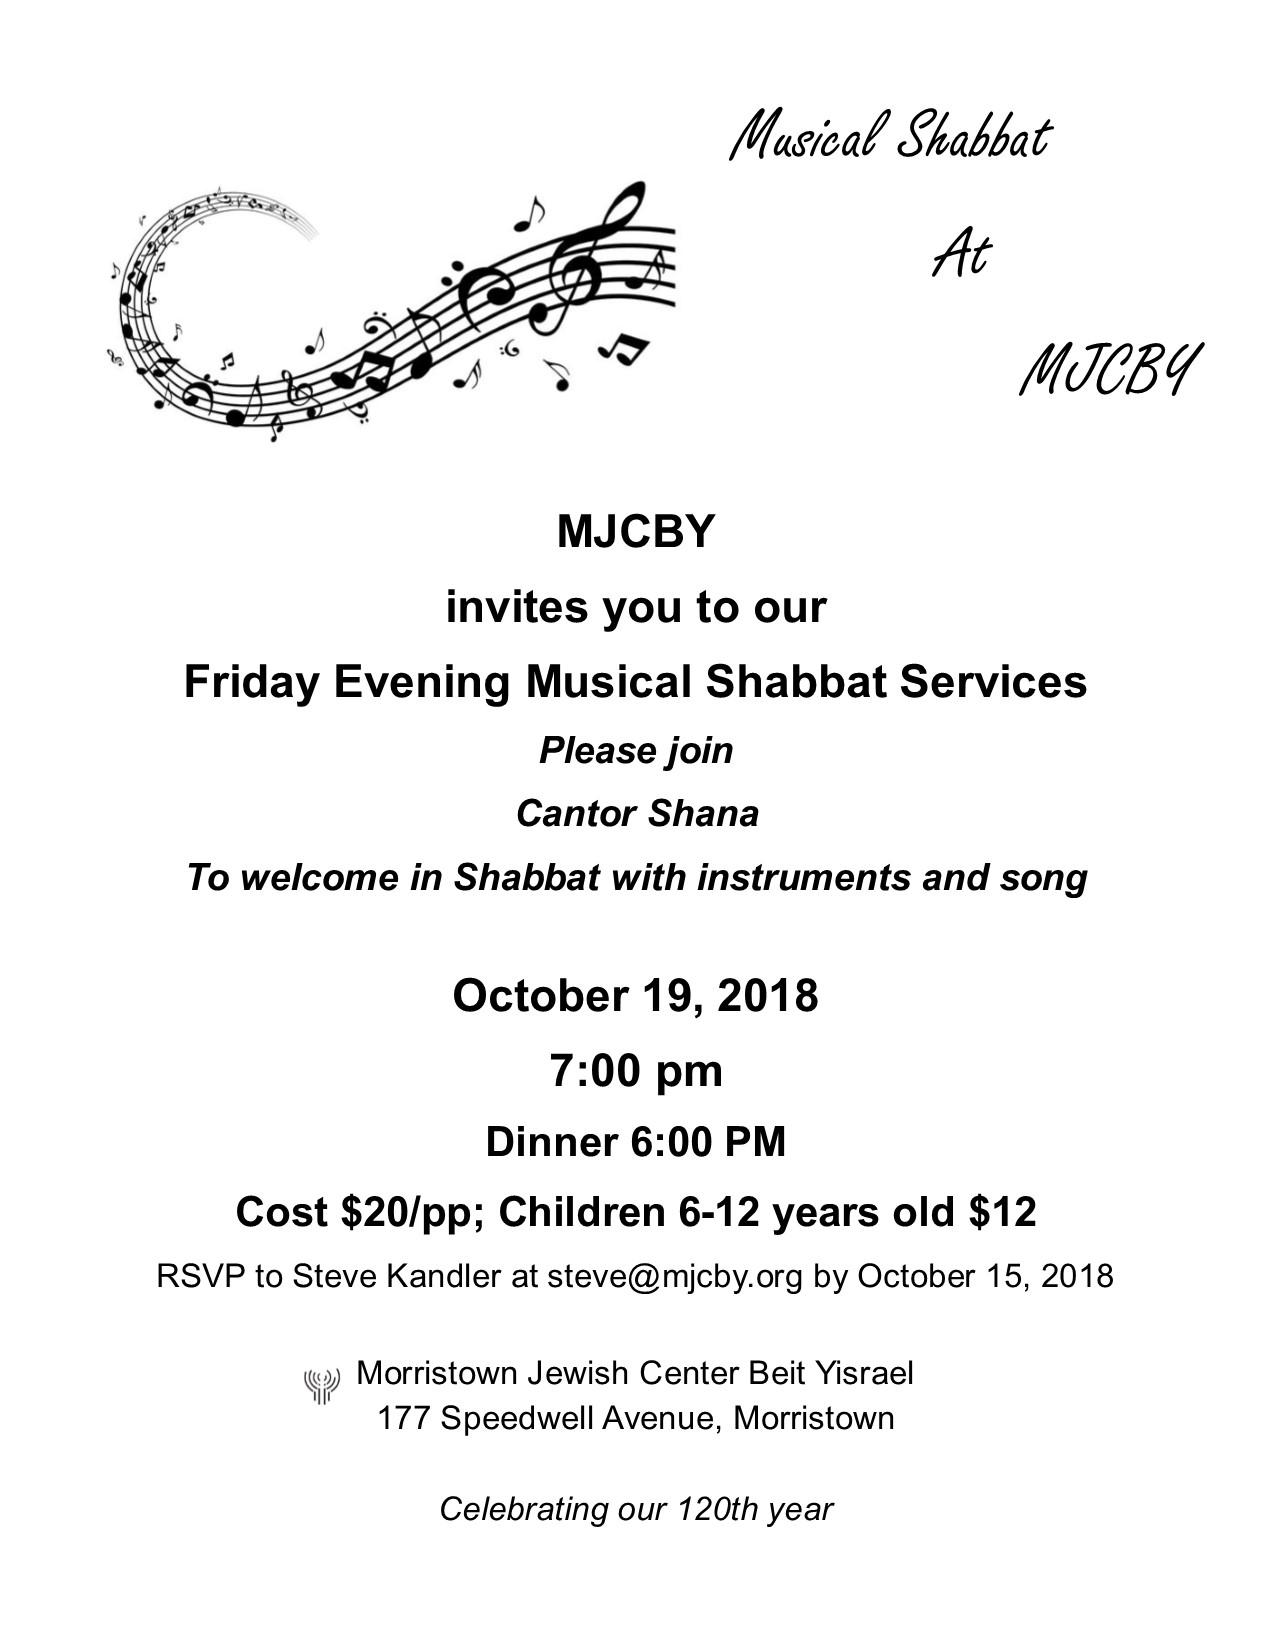 Musical-Shabbat-Oct-2018